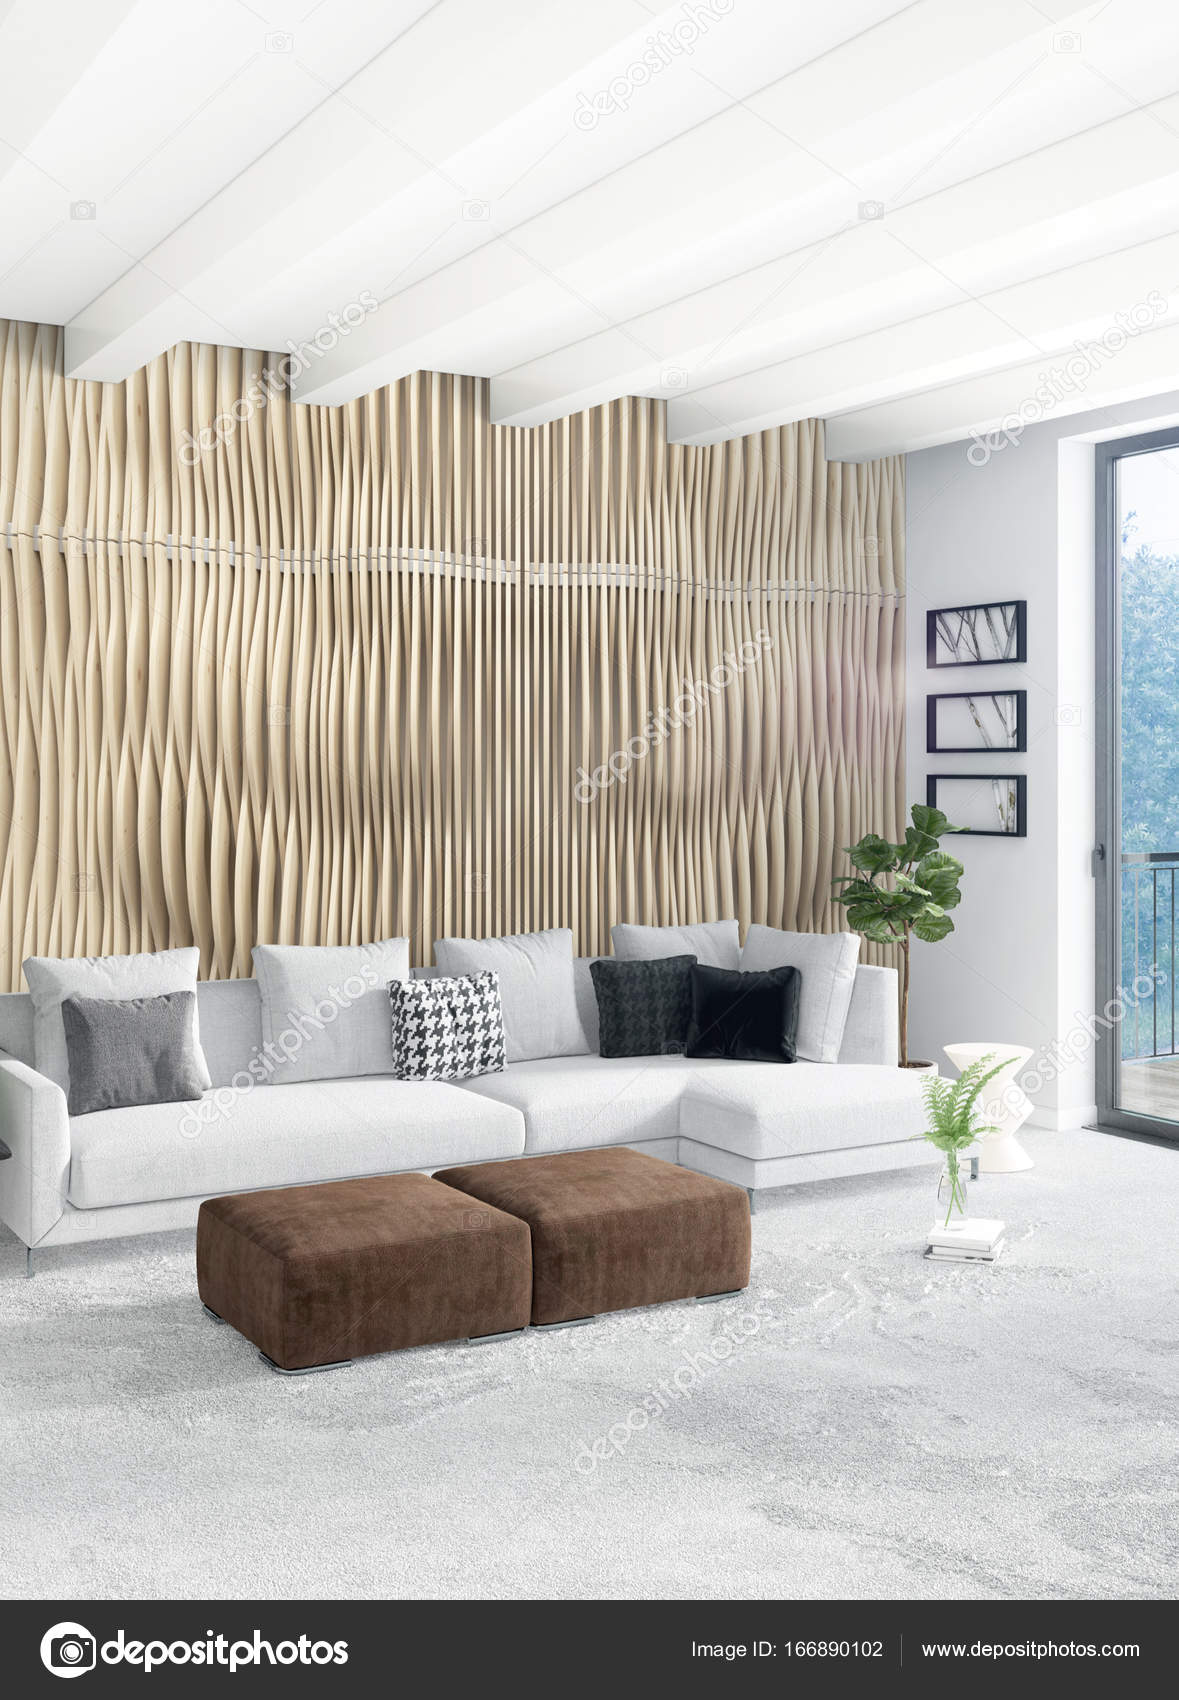 portfolios by architecture copic on rendering sketches pinterest tomita kristina design pin interior architectural sketch art